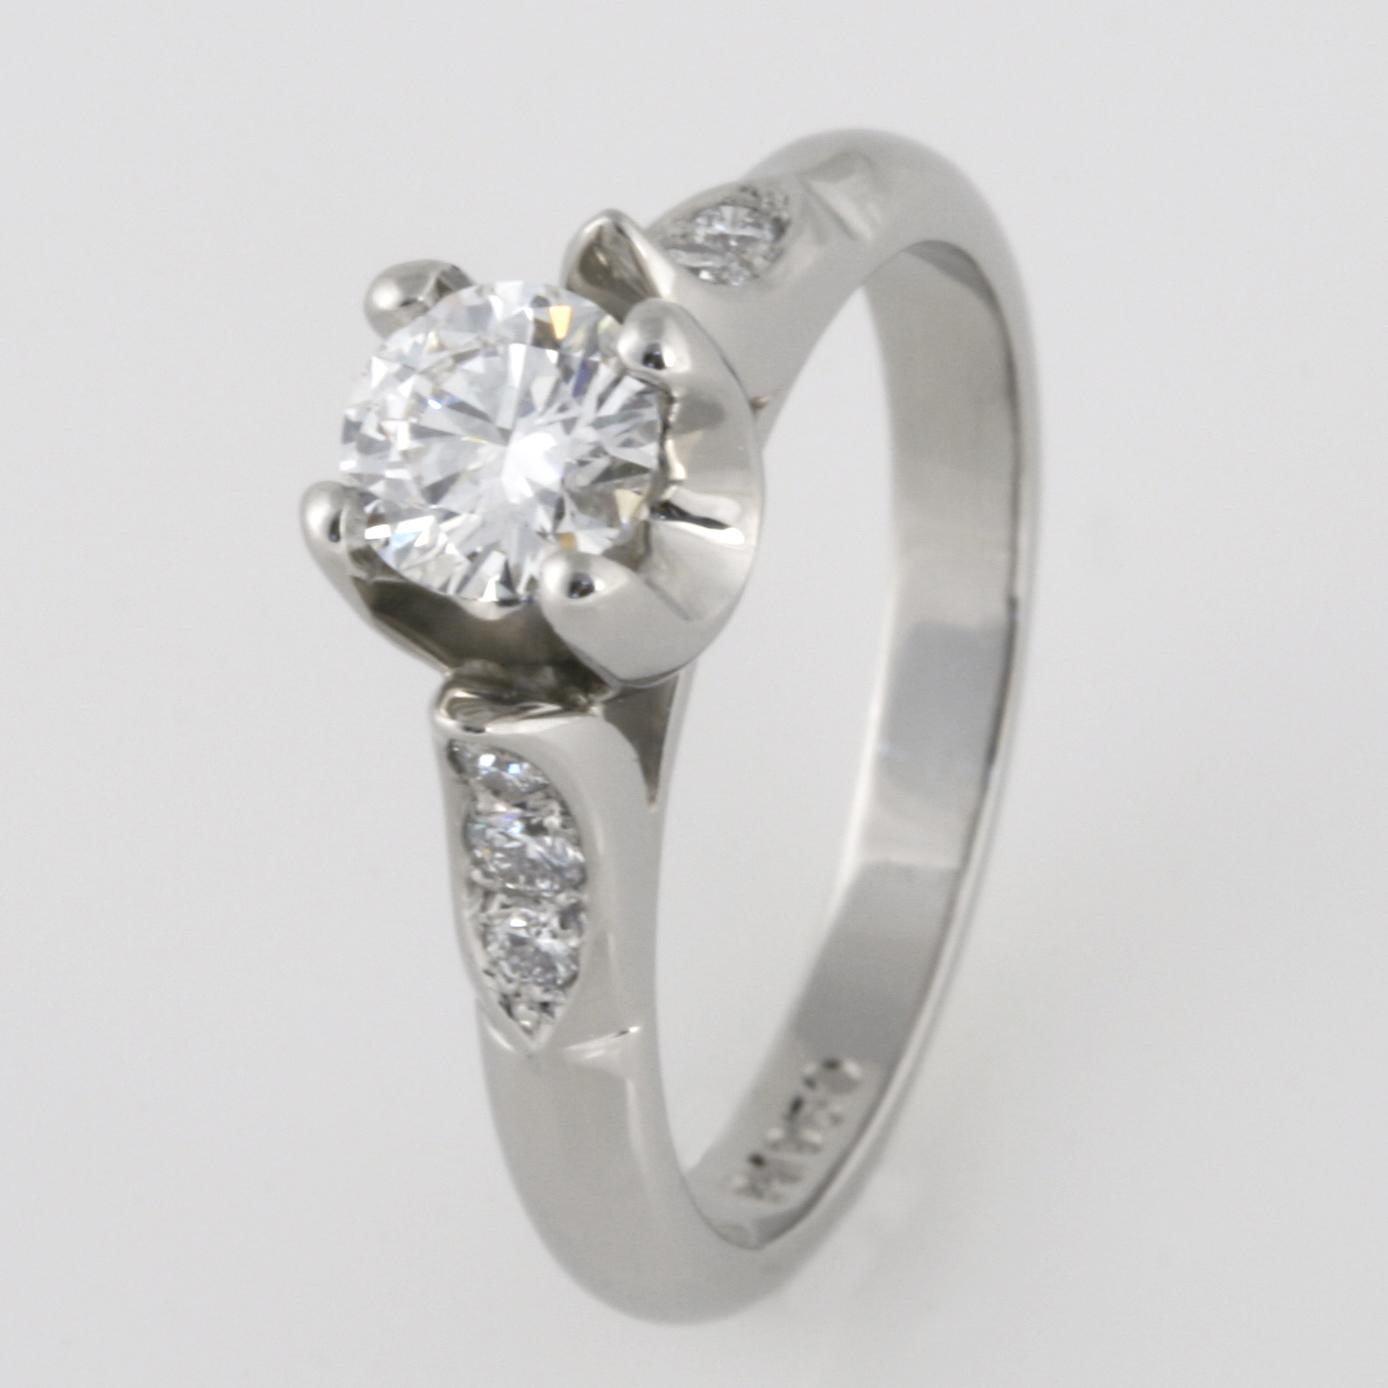 Handmade ladies palladium diamond engagement ring